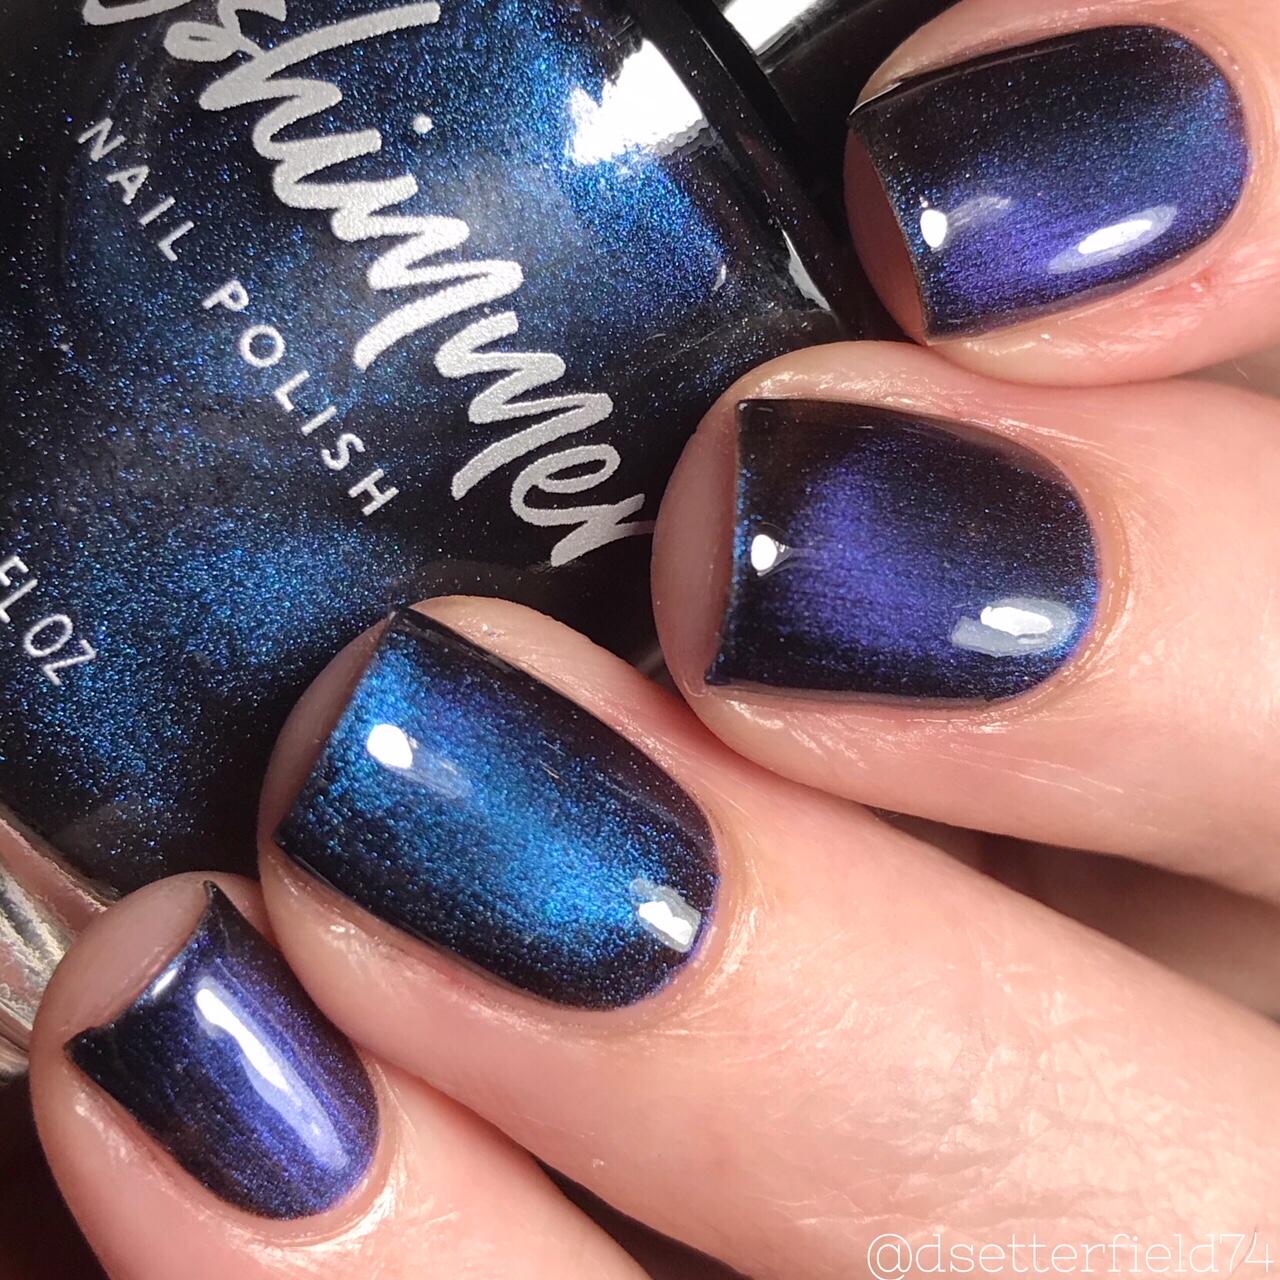 KBShimmer No Comet Multichrome Magnetic Nail Polish